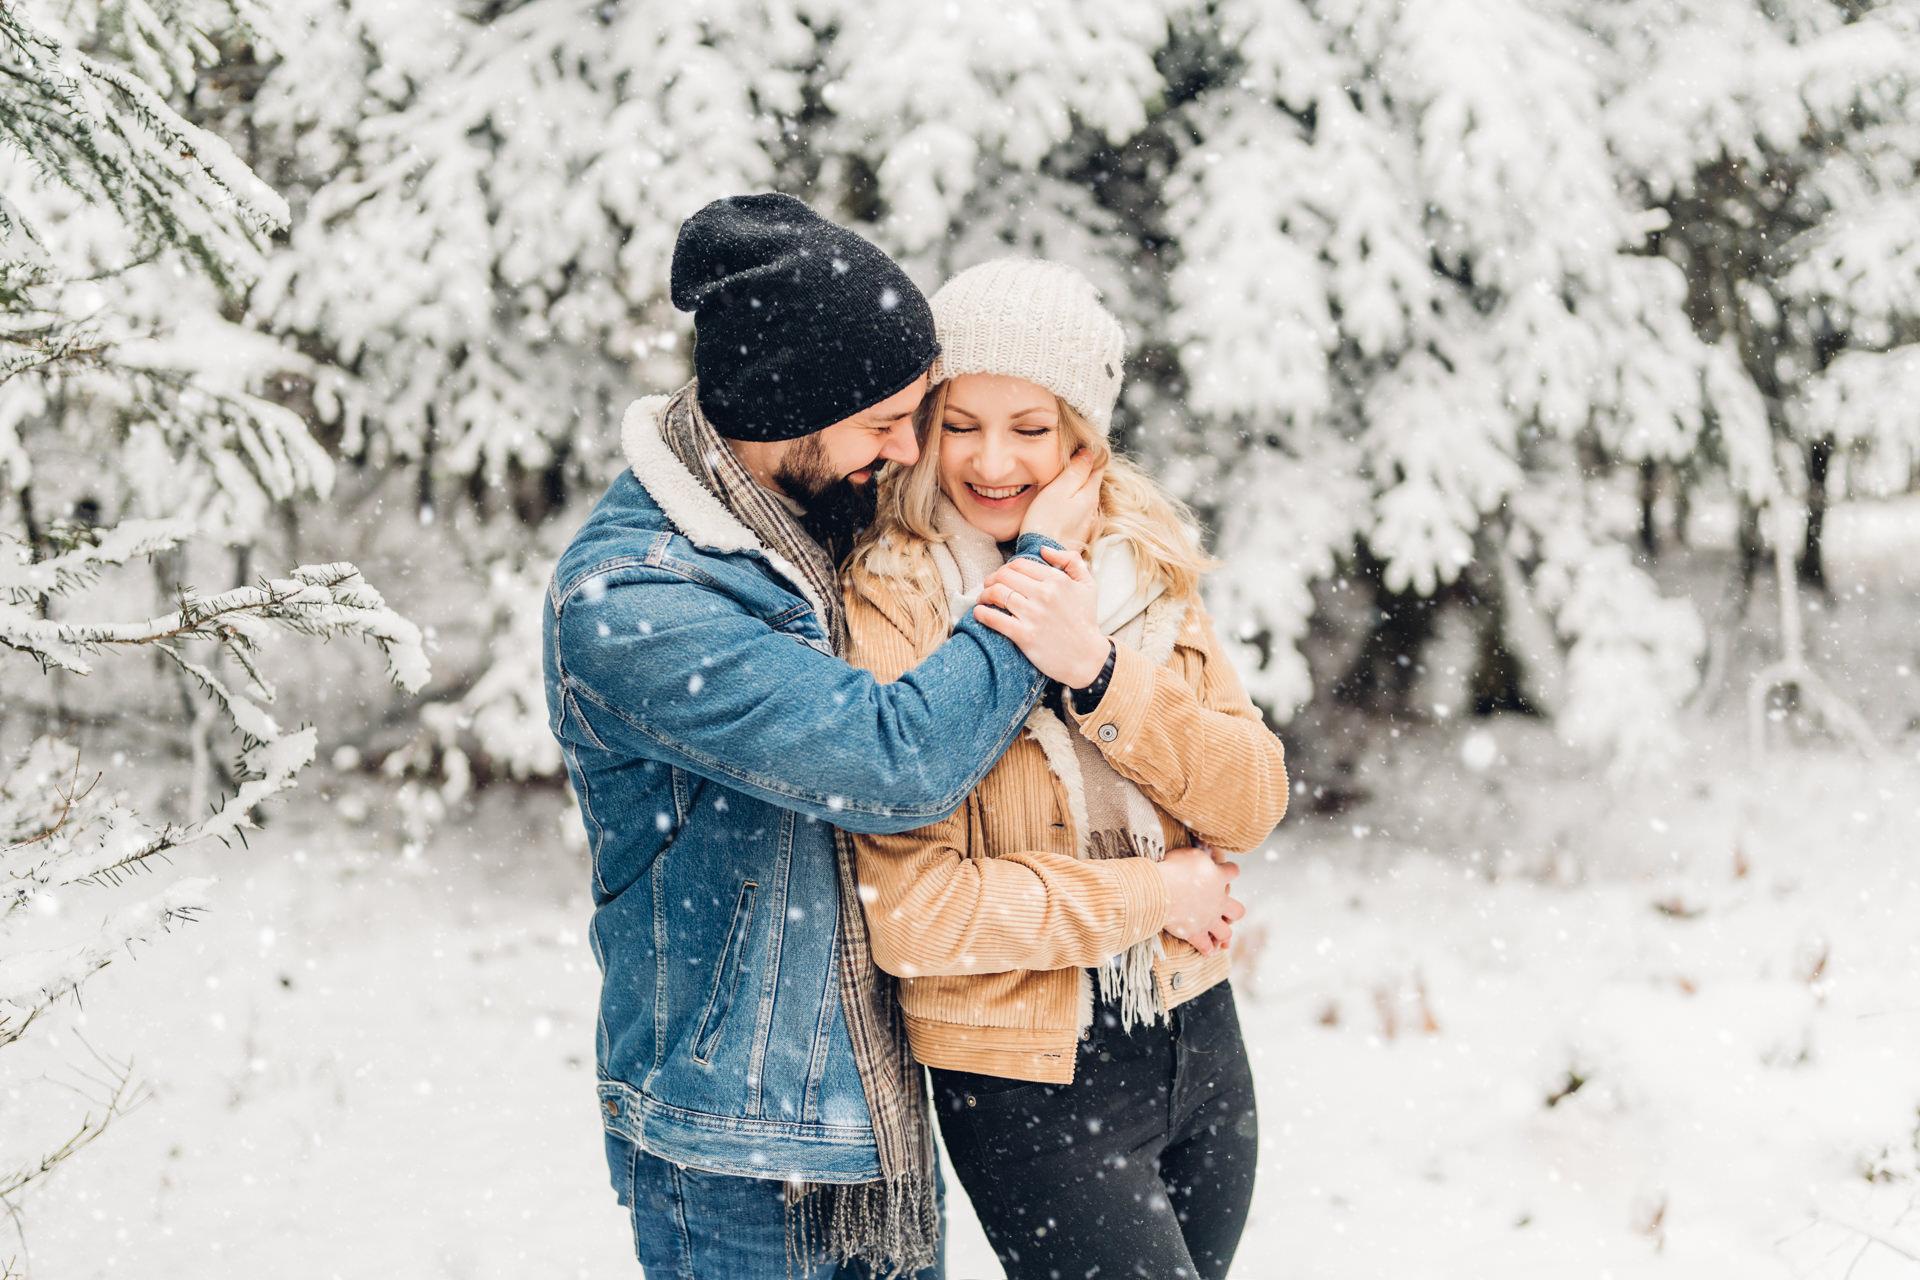 Verlobungsshooting im Schneefall